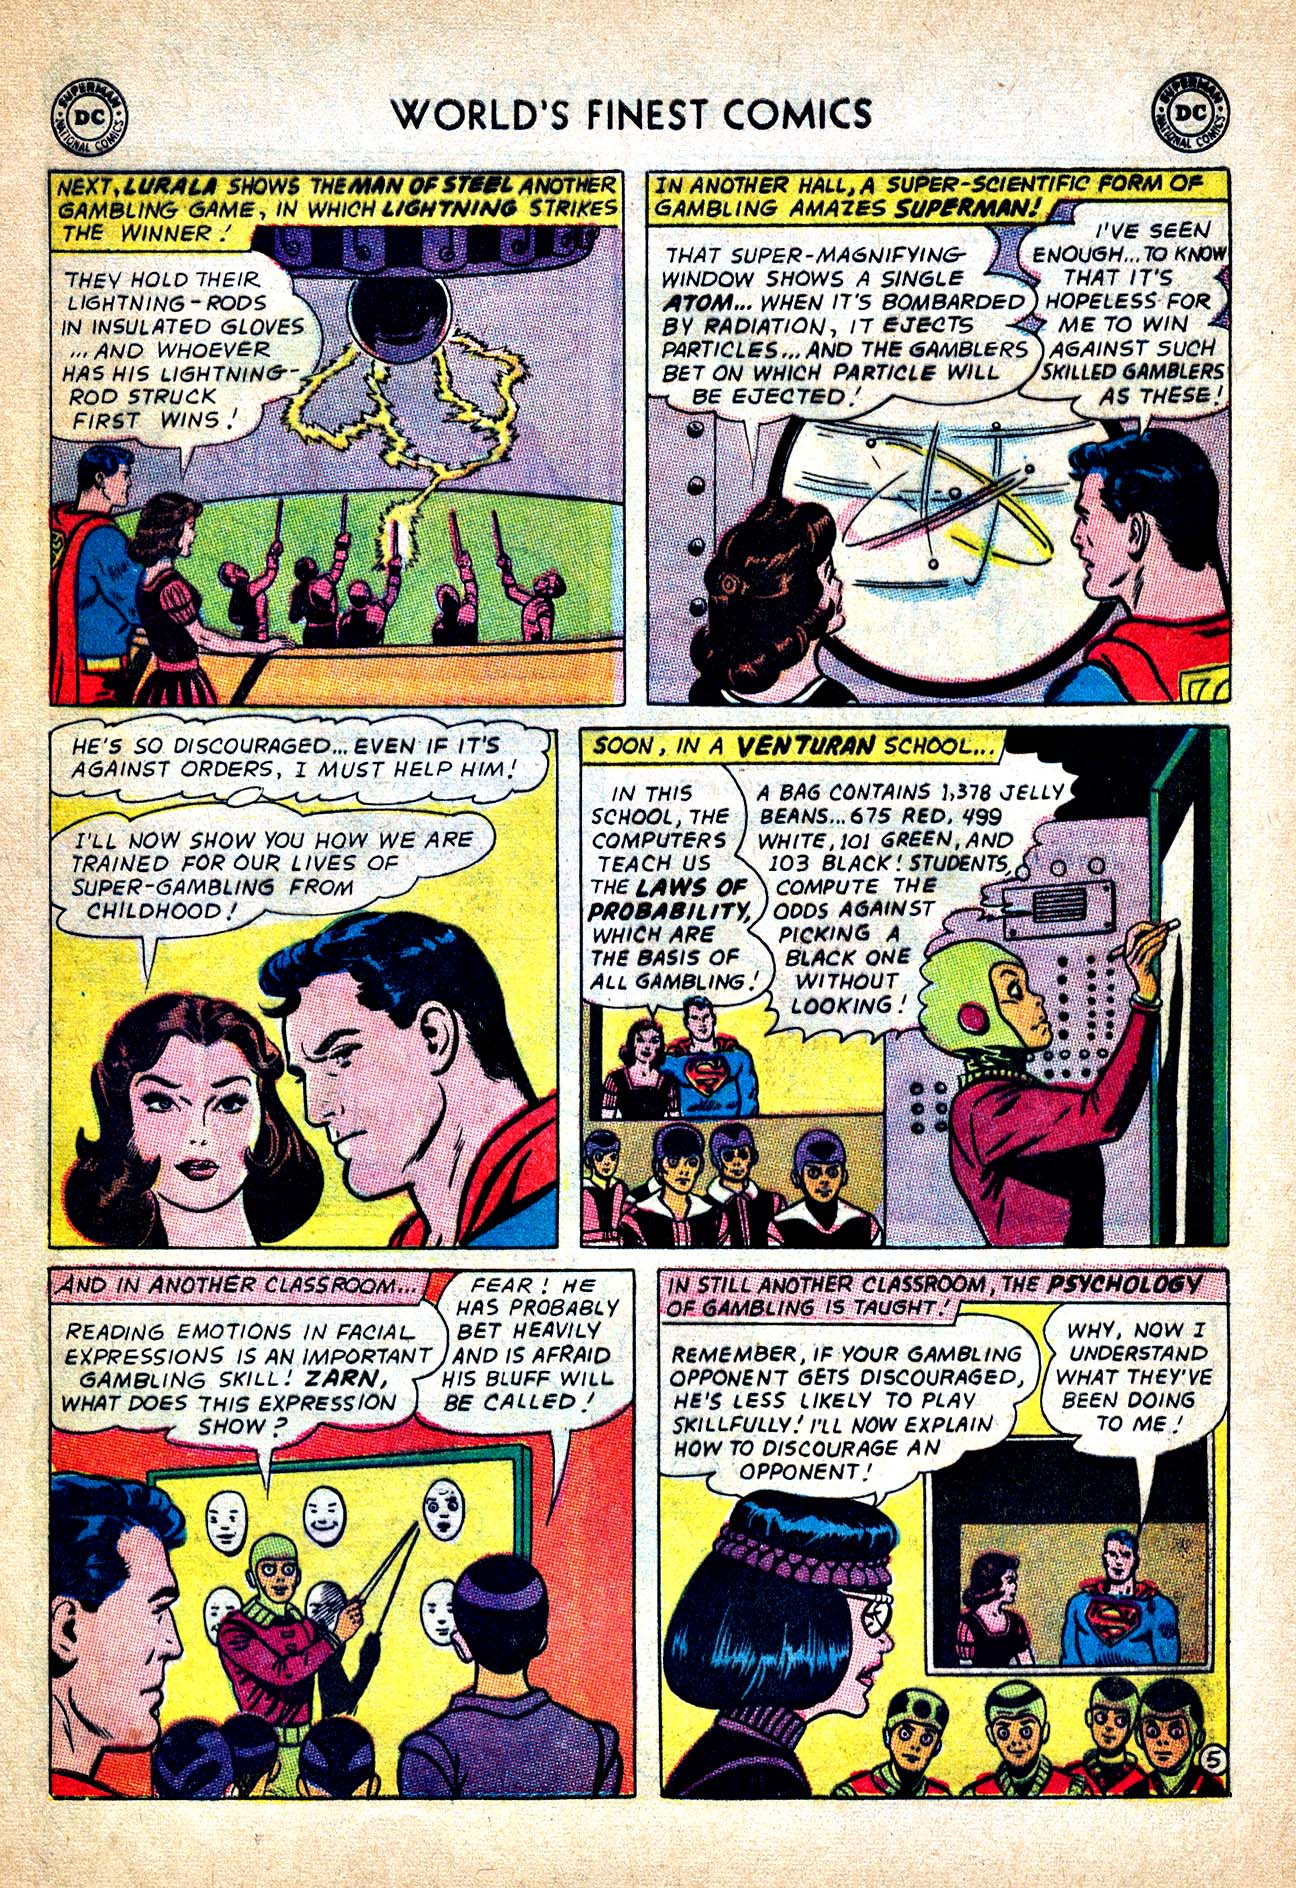 Read online World's Finest Comics comic -  Issue #150 - 17